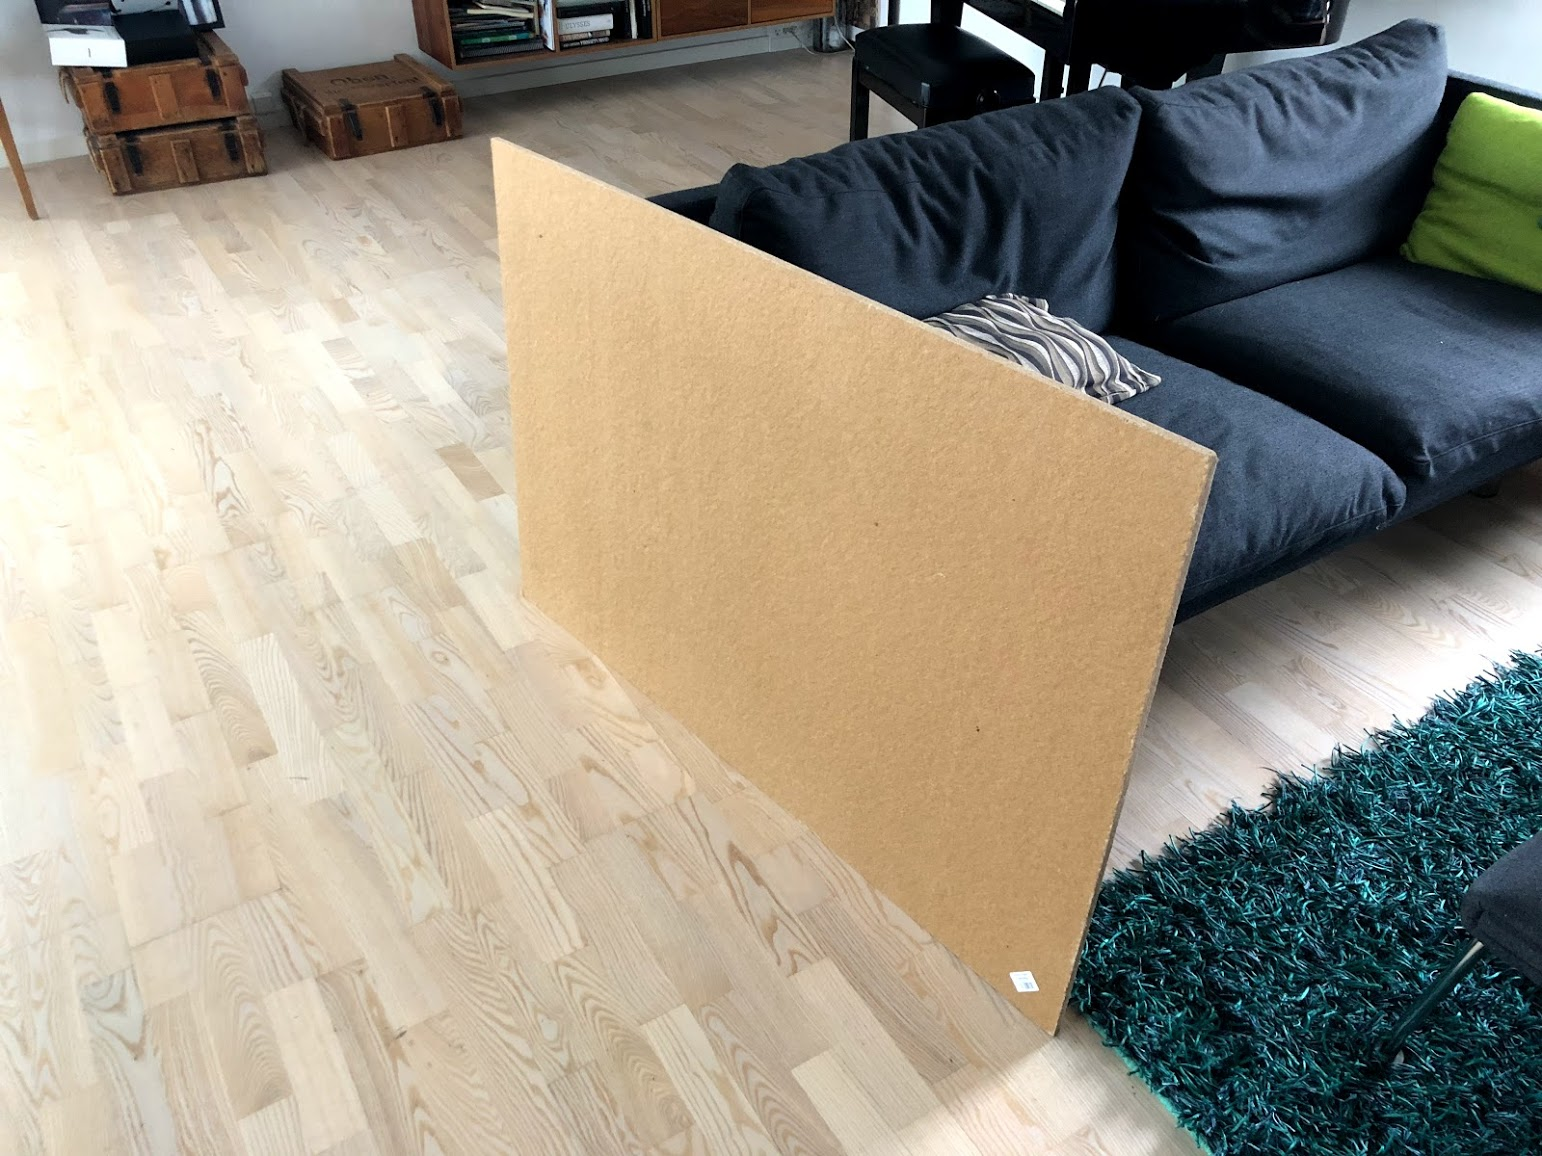 lav din egen opslagstavle hjemmelavet inspiration hvilken plade masonit træfiber hvordan laver man hjemmelavet tavle